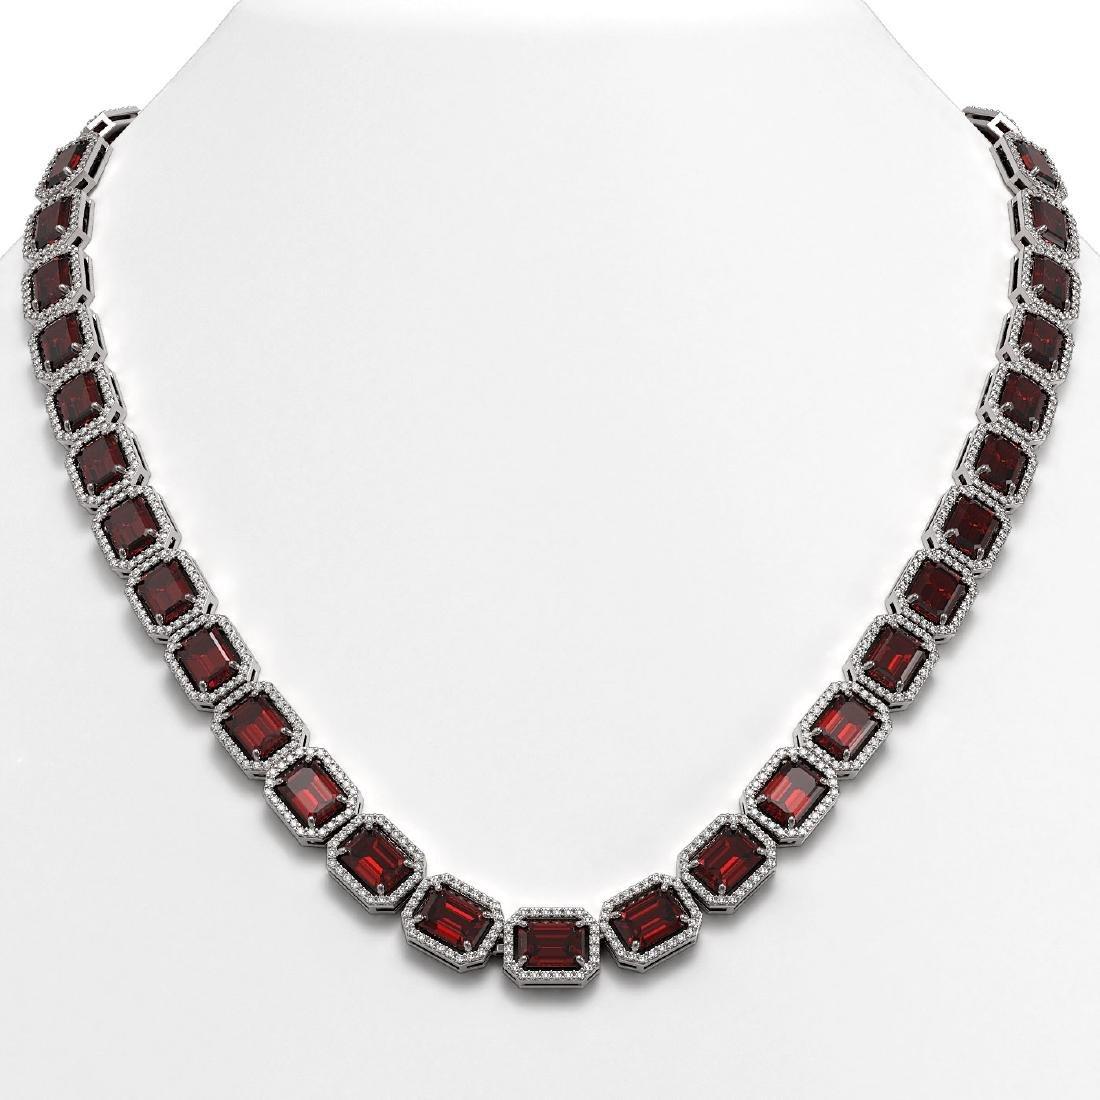 60.59 CTW Garnet & Diamond Halo Necklace 10K White Gold